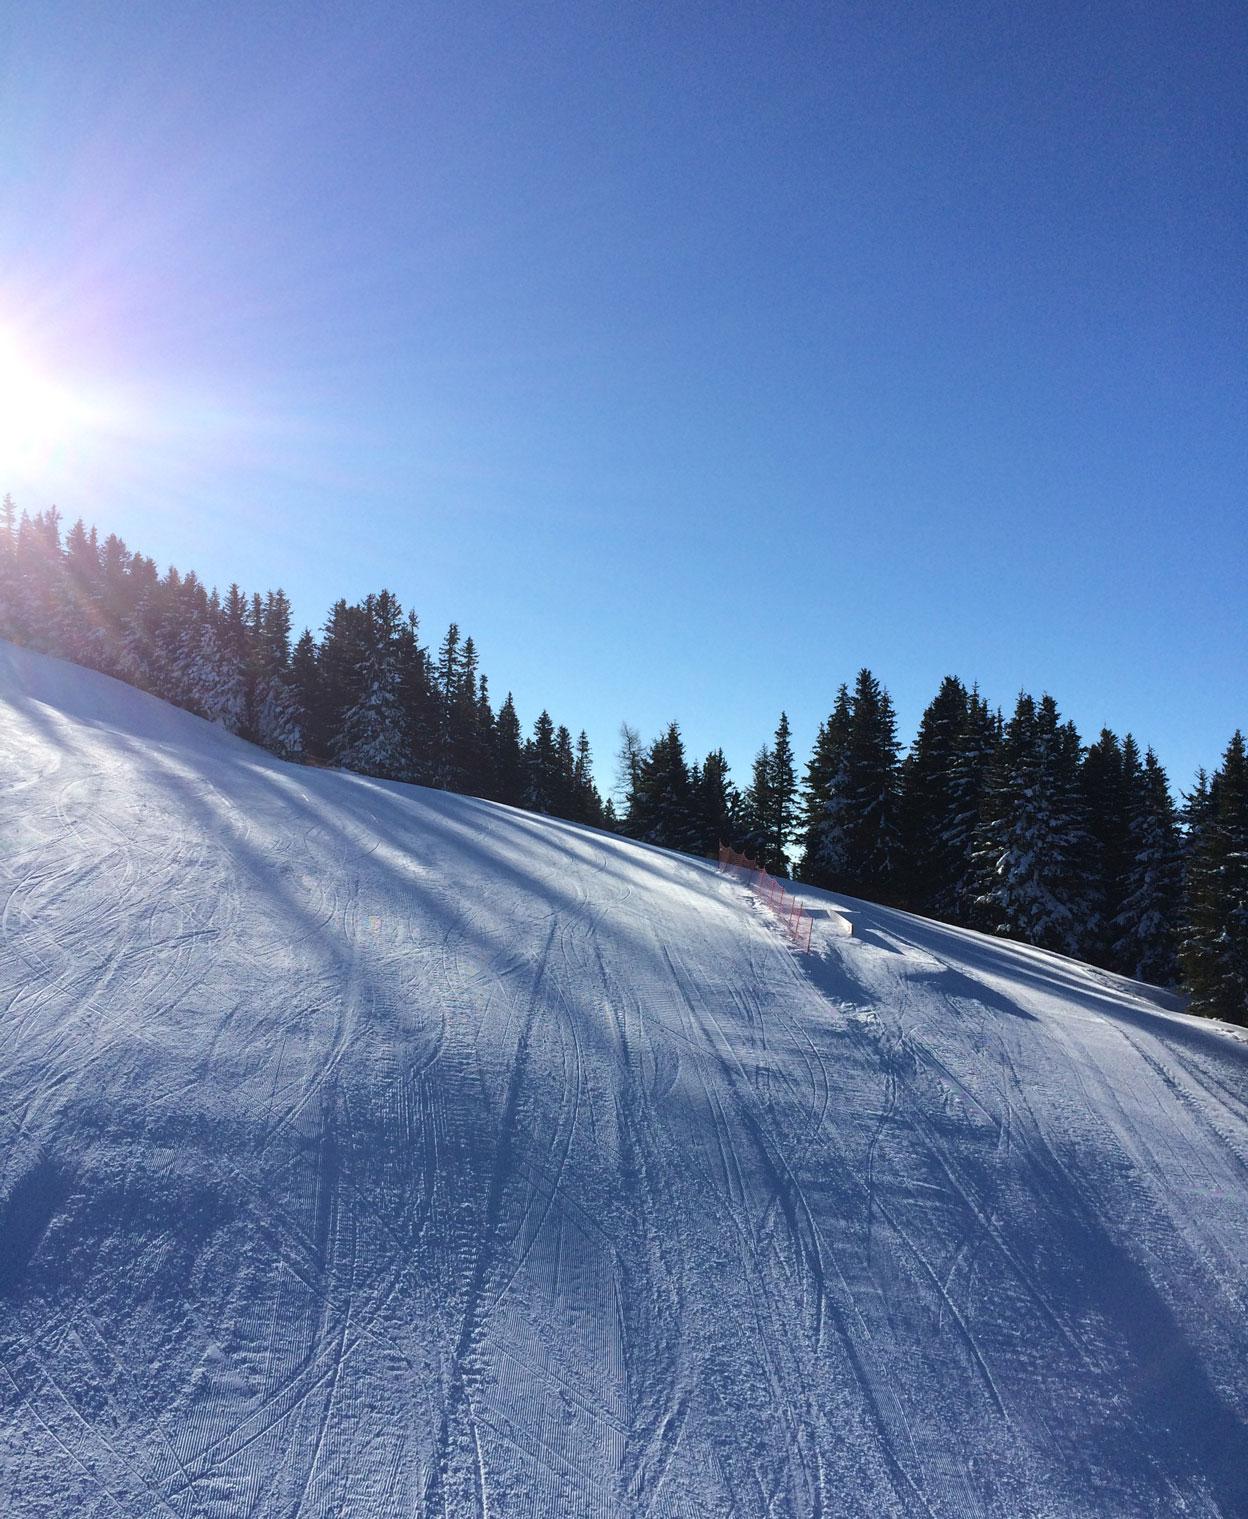 munich-mountain-girls-verena-buerstl-patscherkofel-ski-fahren-tirol